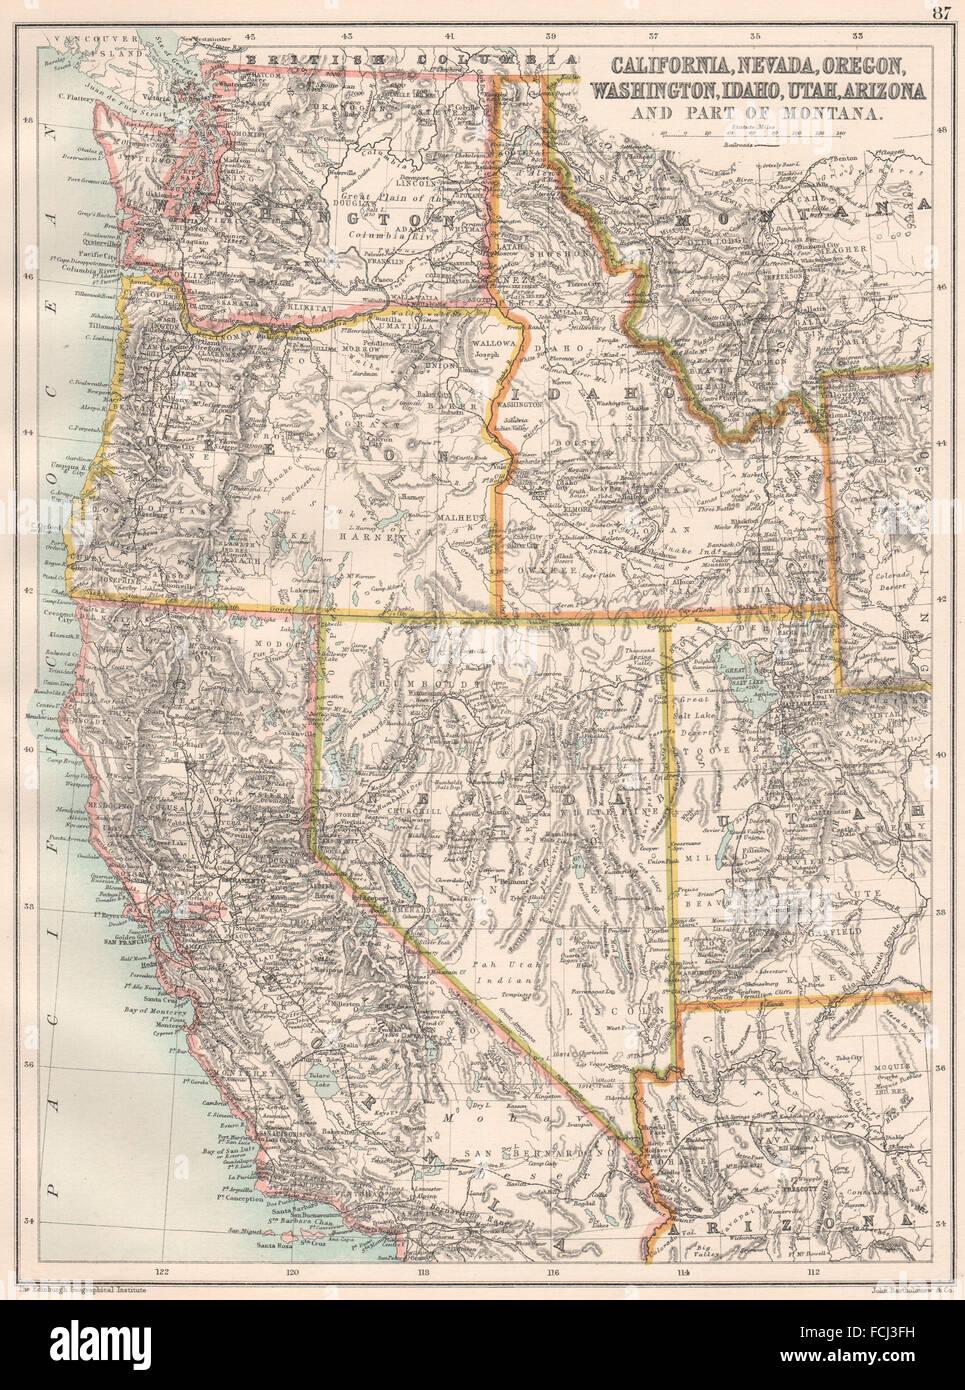 Karte Usa Westen.Westen Der Usa Kalifornien Nevada Oregon Washington Idaho Utah